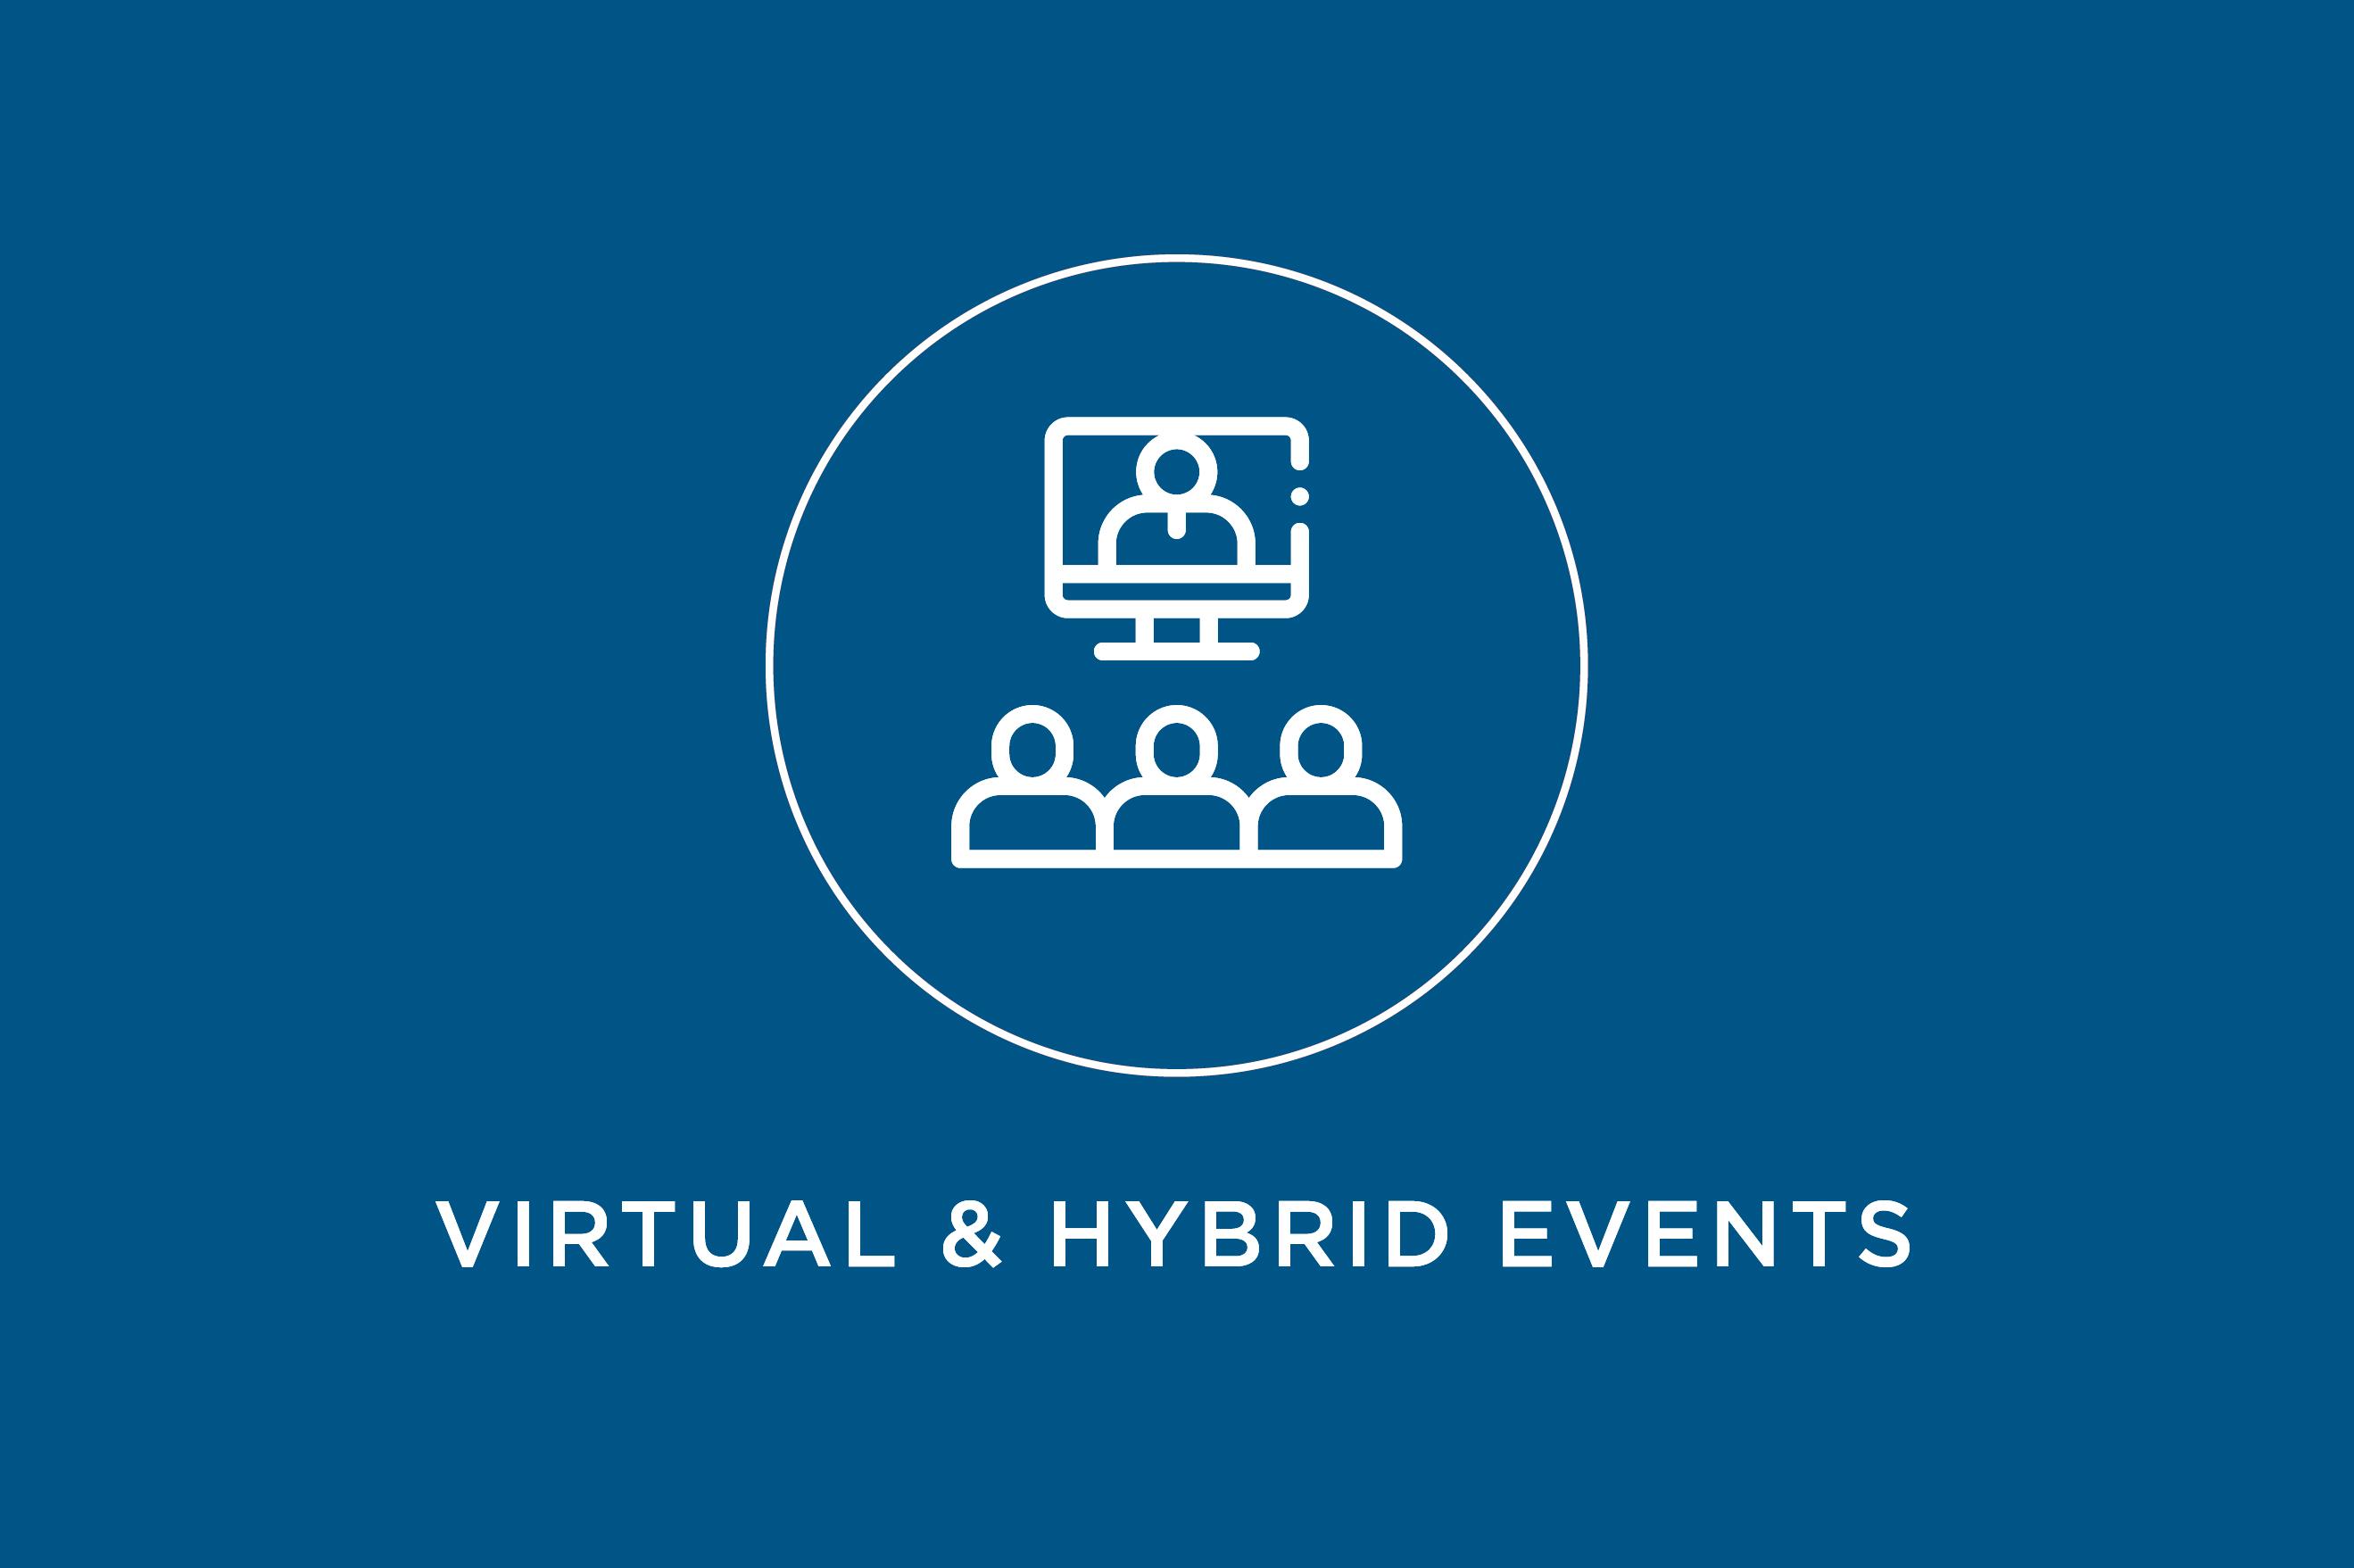 Digital Events Virtual Hybrid Events